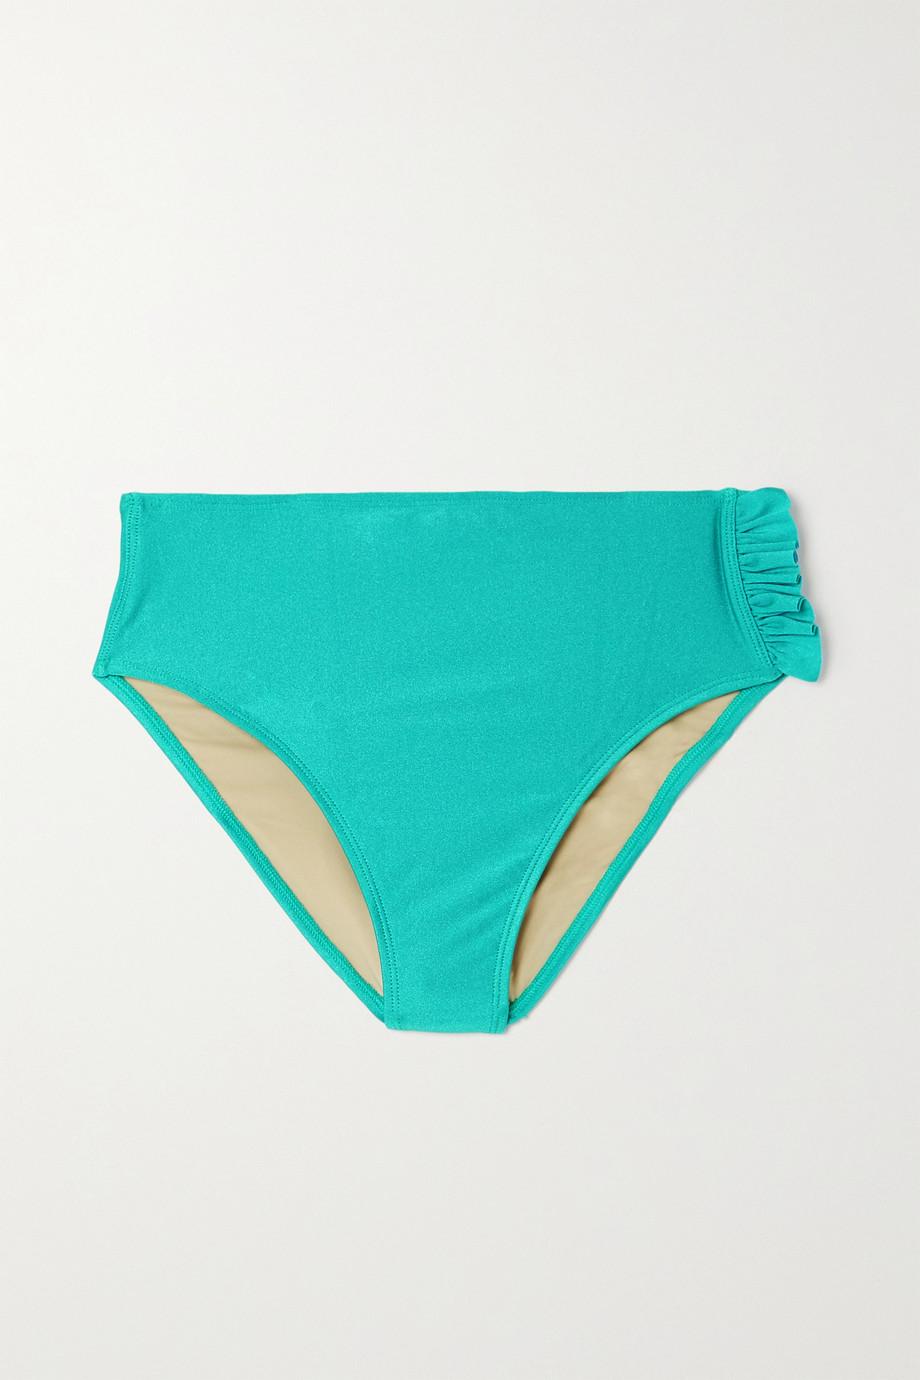 Leslie Amon Tamini ruffled bikini briefs